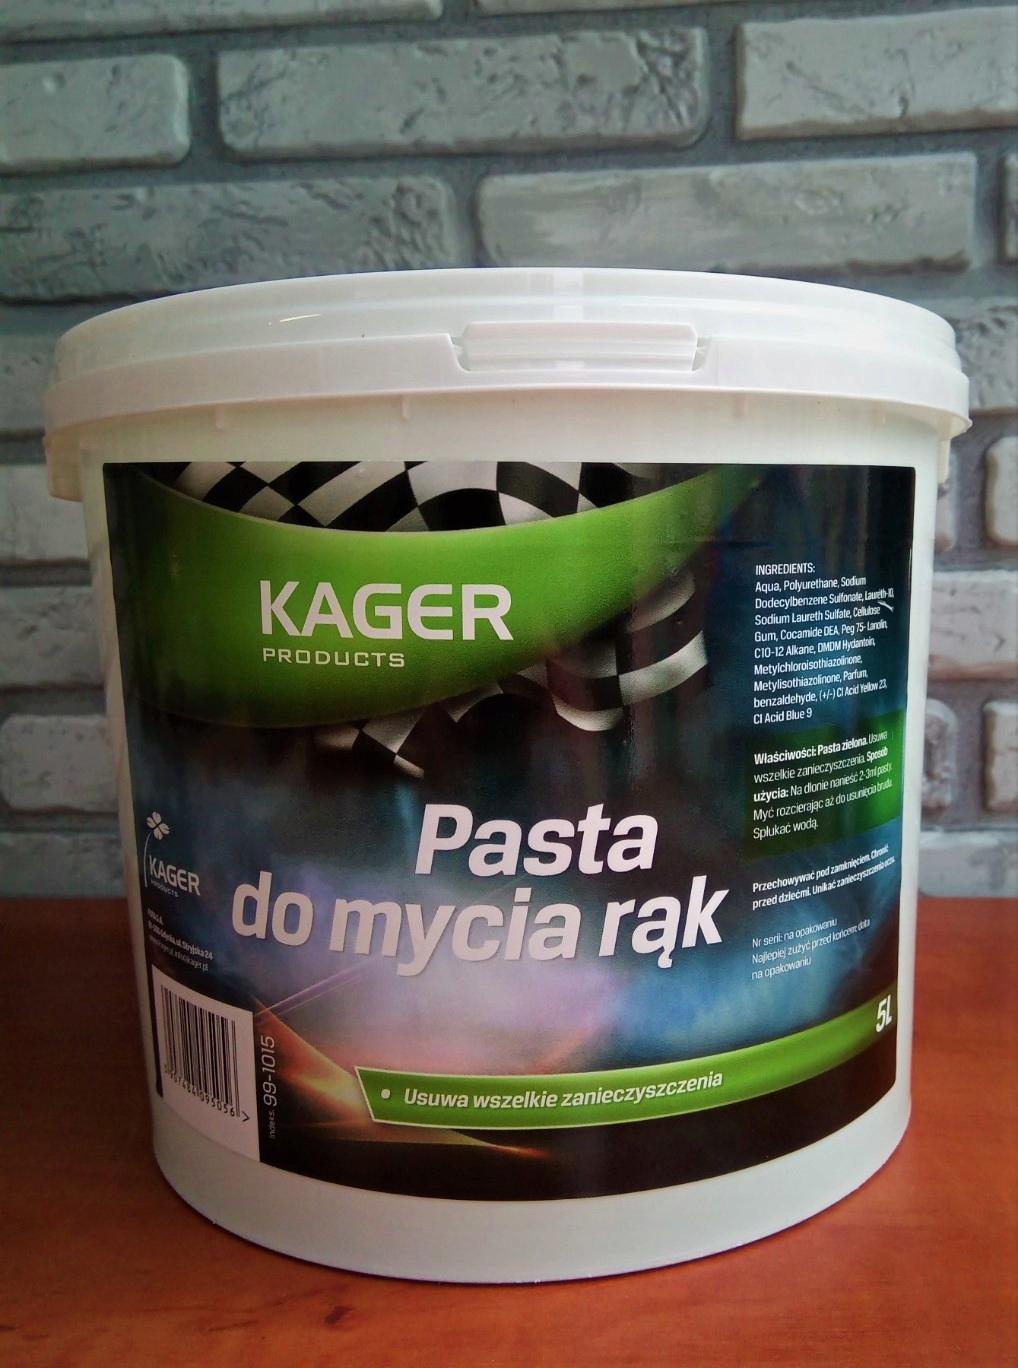 KAGER Handpaste для охраны труда и техники безопасности 5 л оригинал удаляет жир